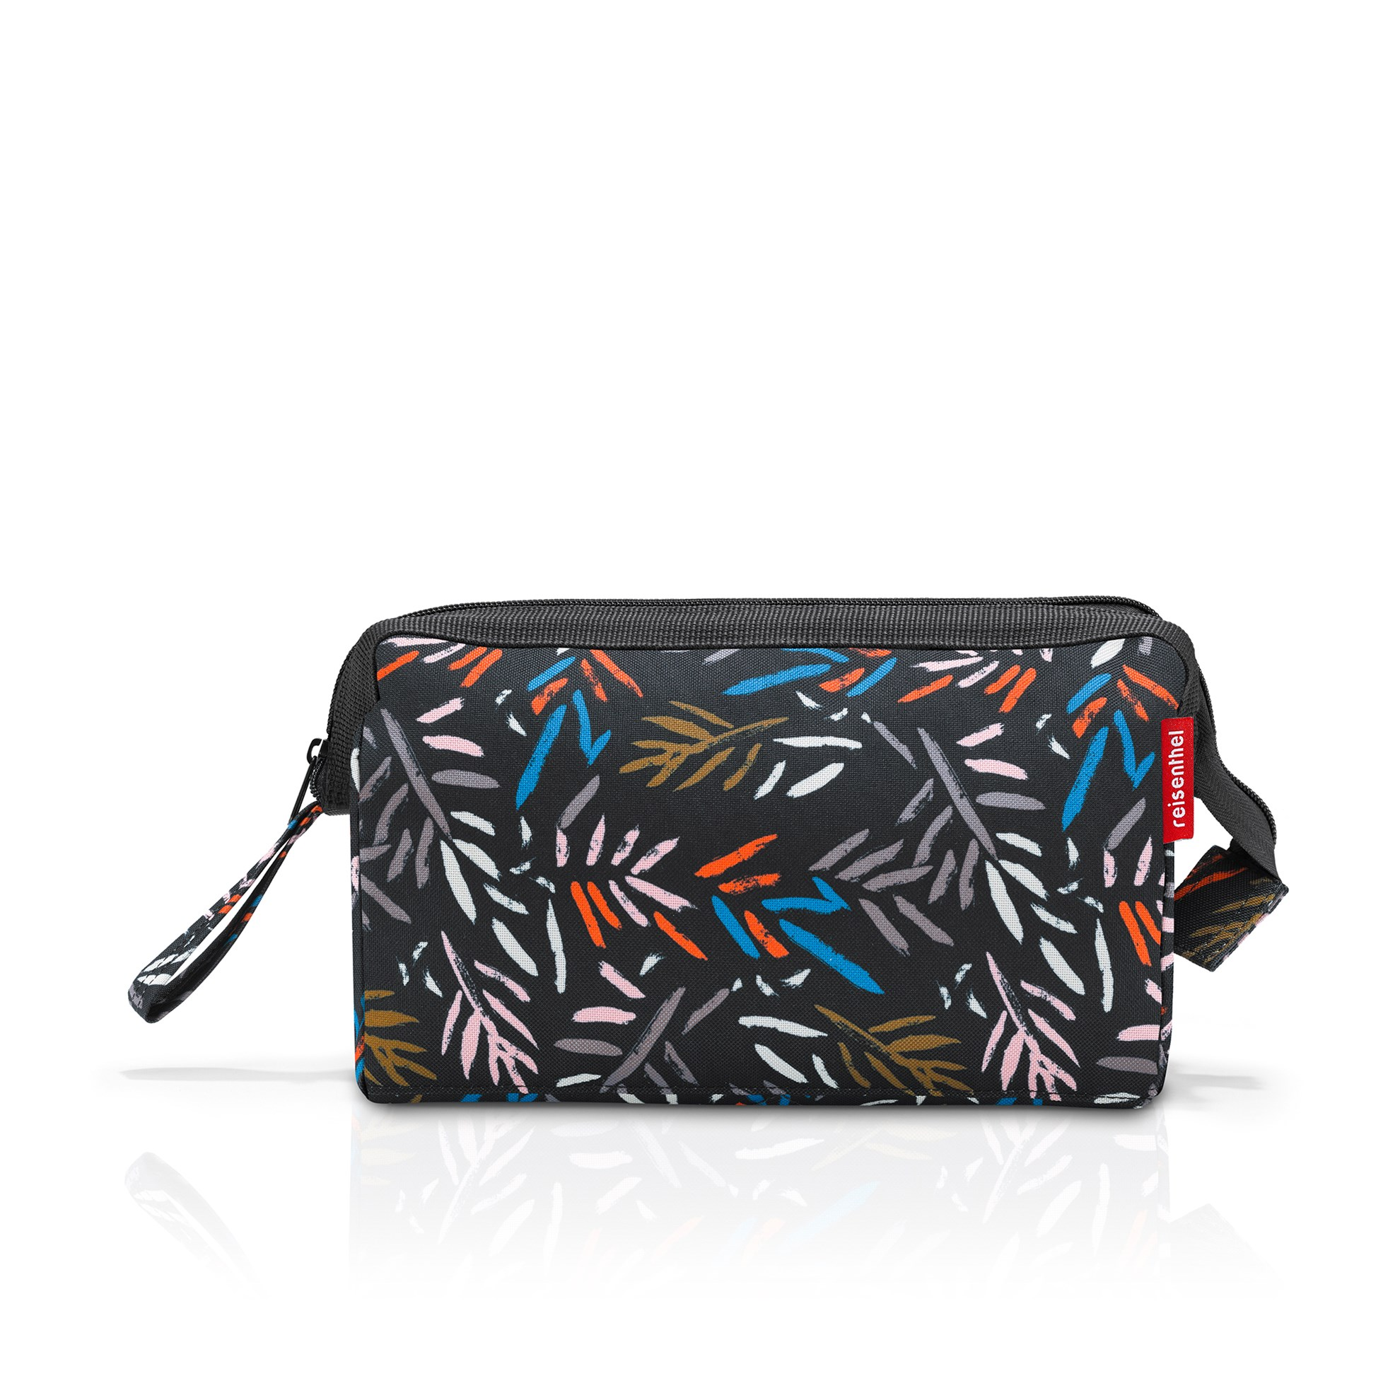 Kosmetická taška Travelcosmetic autumn 1_1